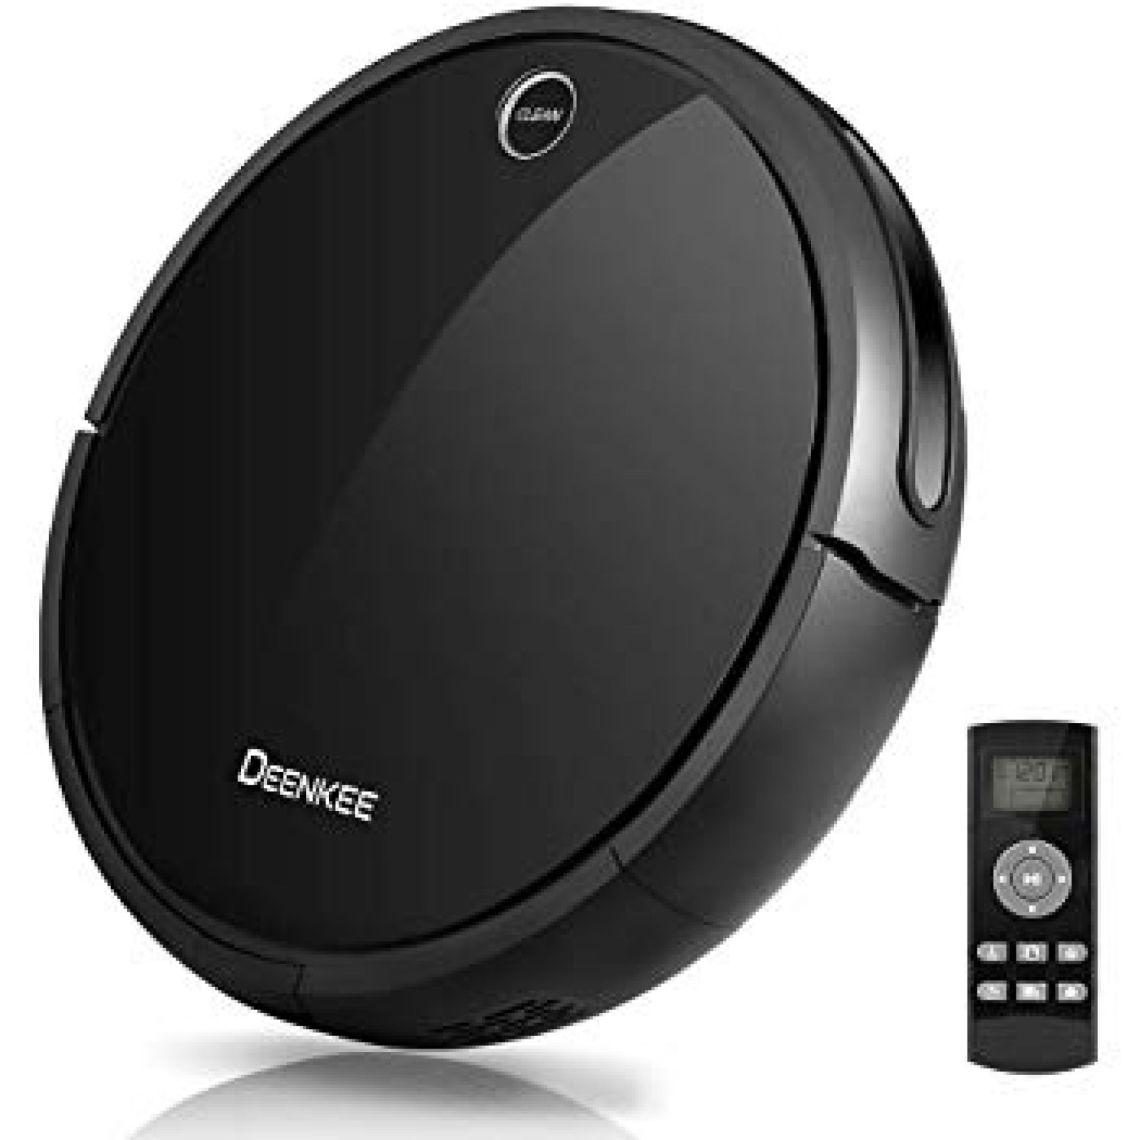 Amazon.com: Robot Vacuum Cleaner, Deenkee Automatic Vacuum Cleaner Robot with Mop for Pet Hair, Carpet and Hardwood Floor (Black): Kitchen & Dining